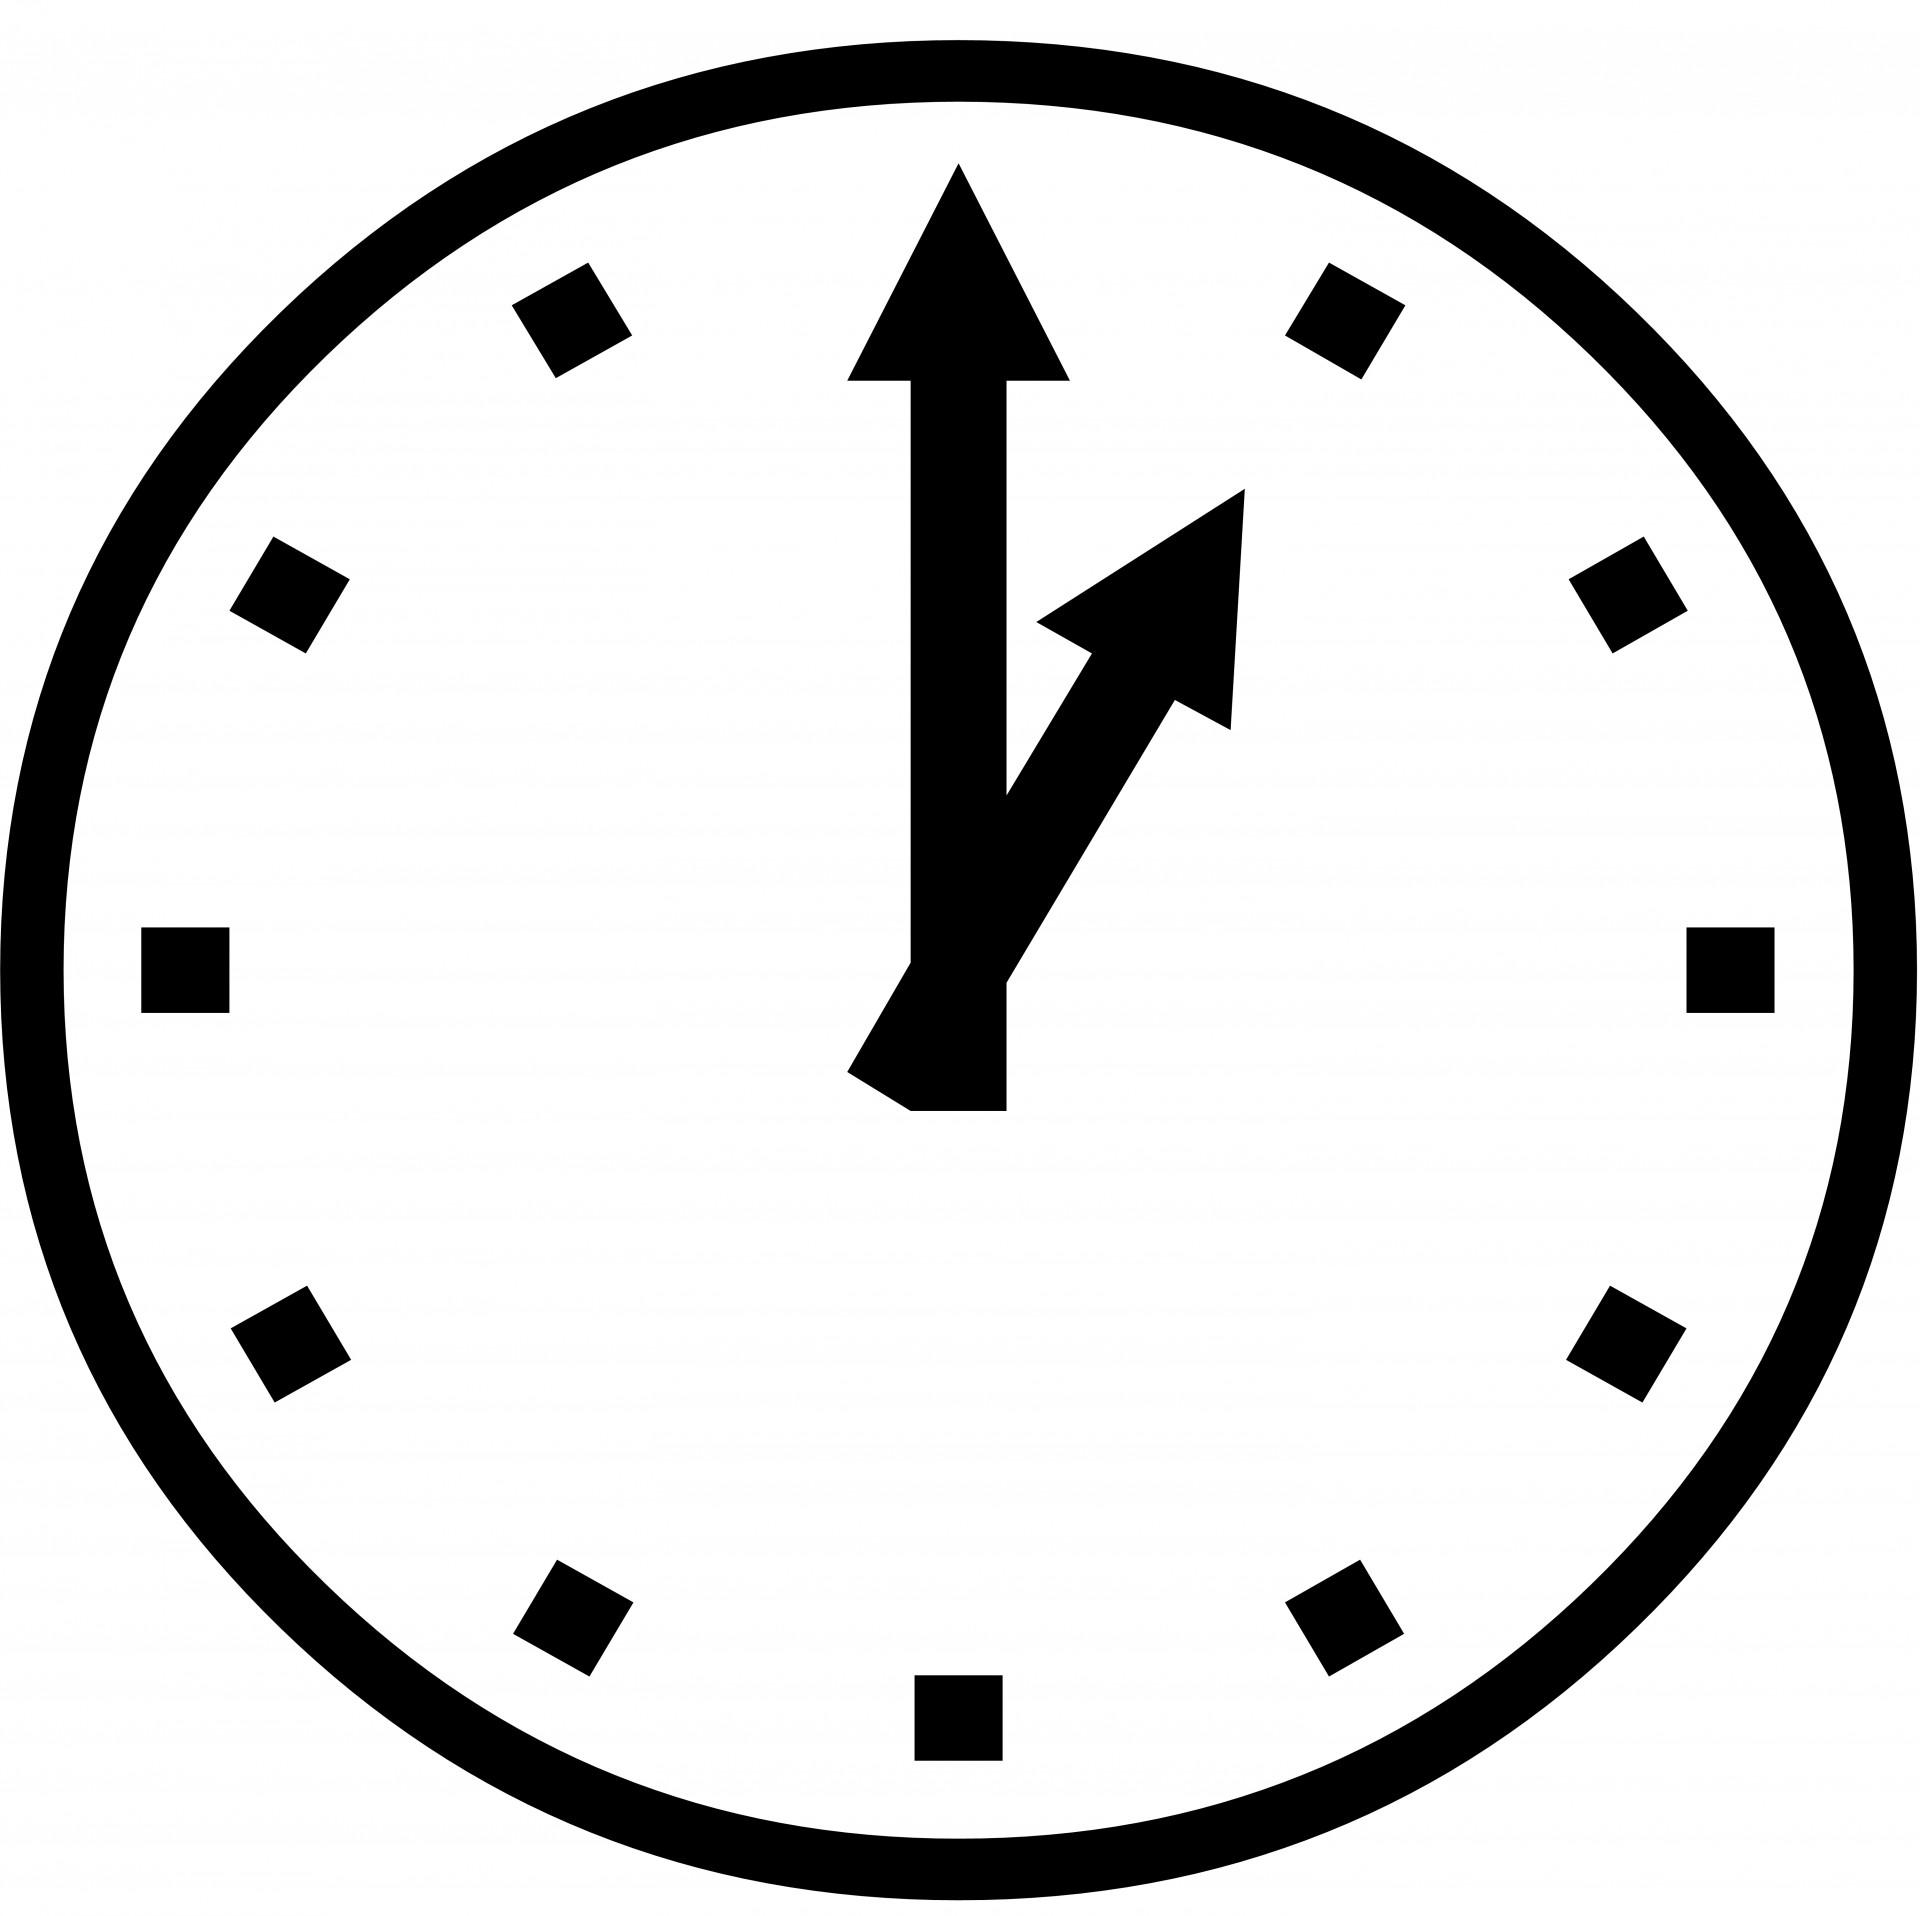 Clock Icon Free Stock Photo - Public Domain Pictures